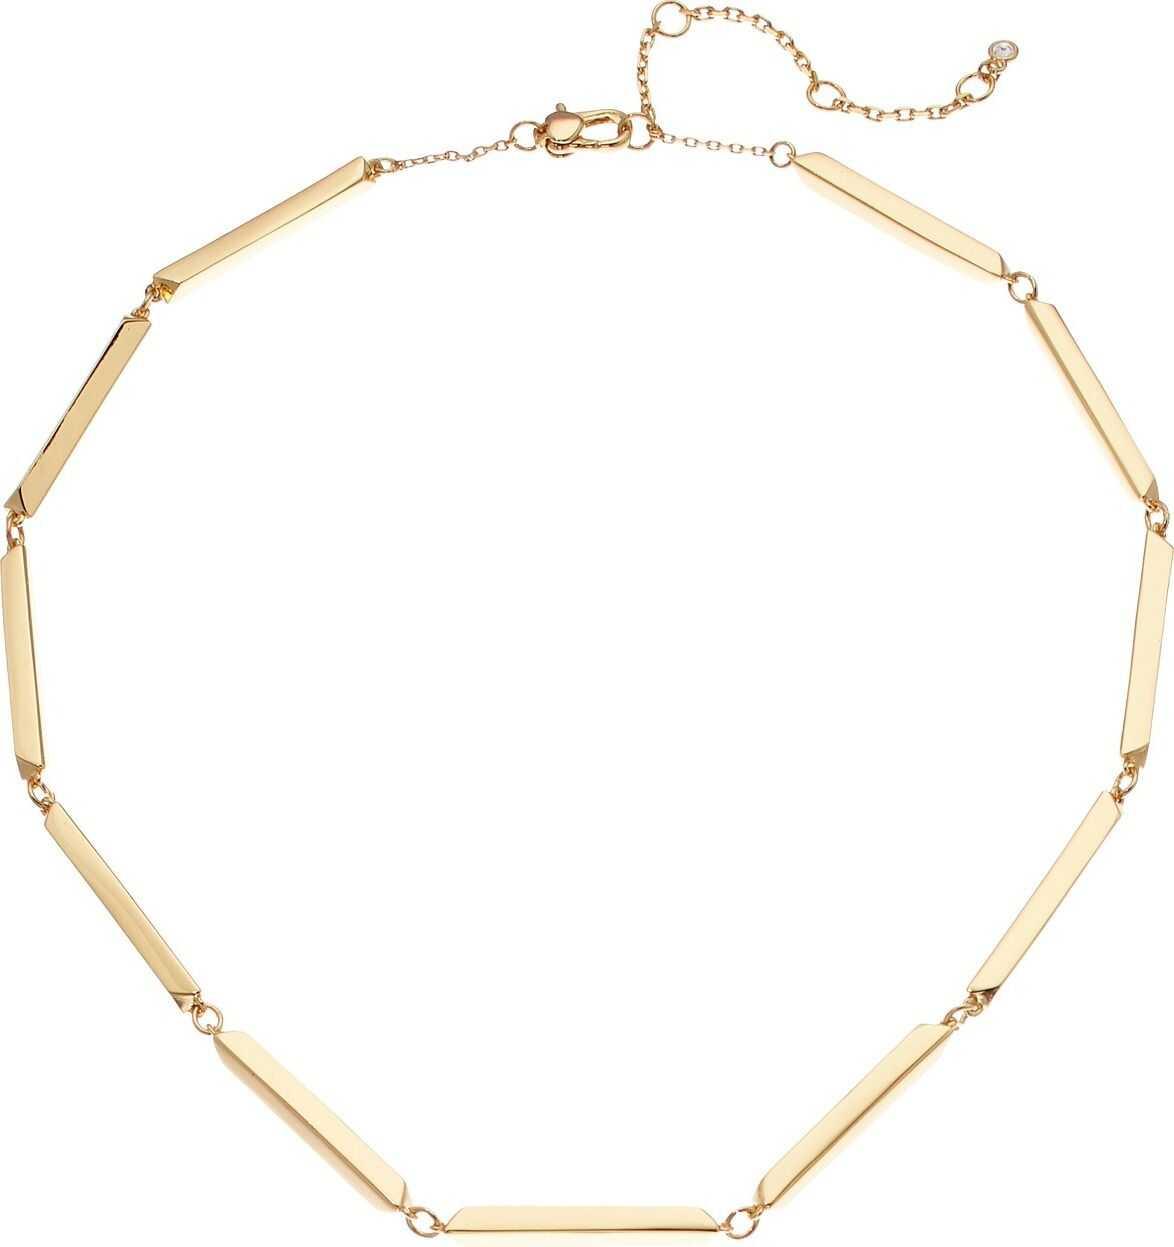 Kate Spade New York Raise The Bar Necklace Gold